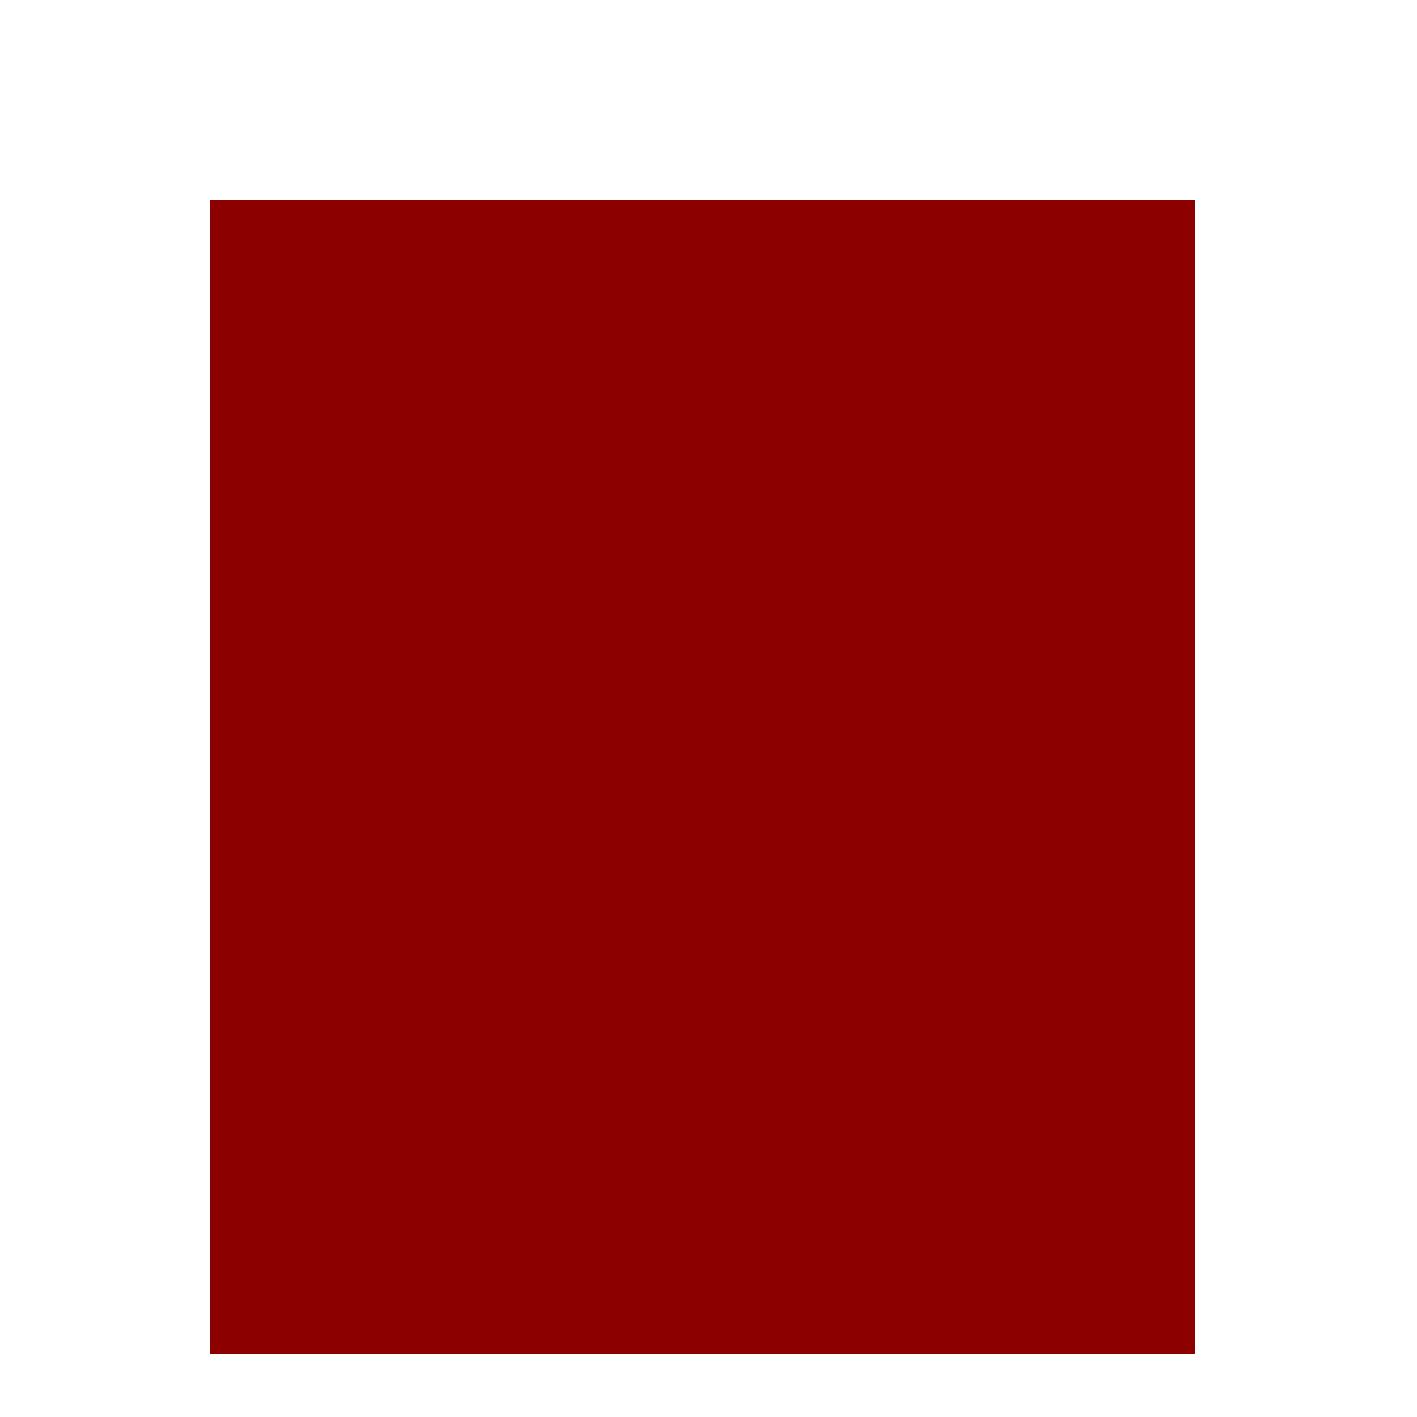 Hawthornearts